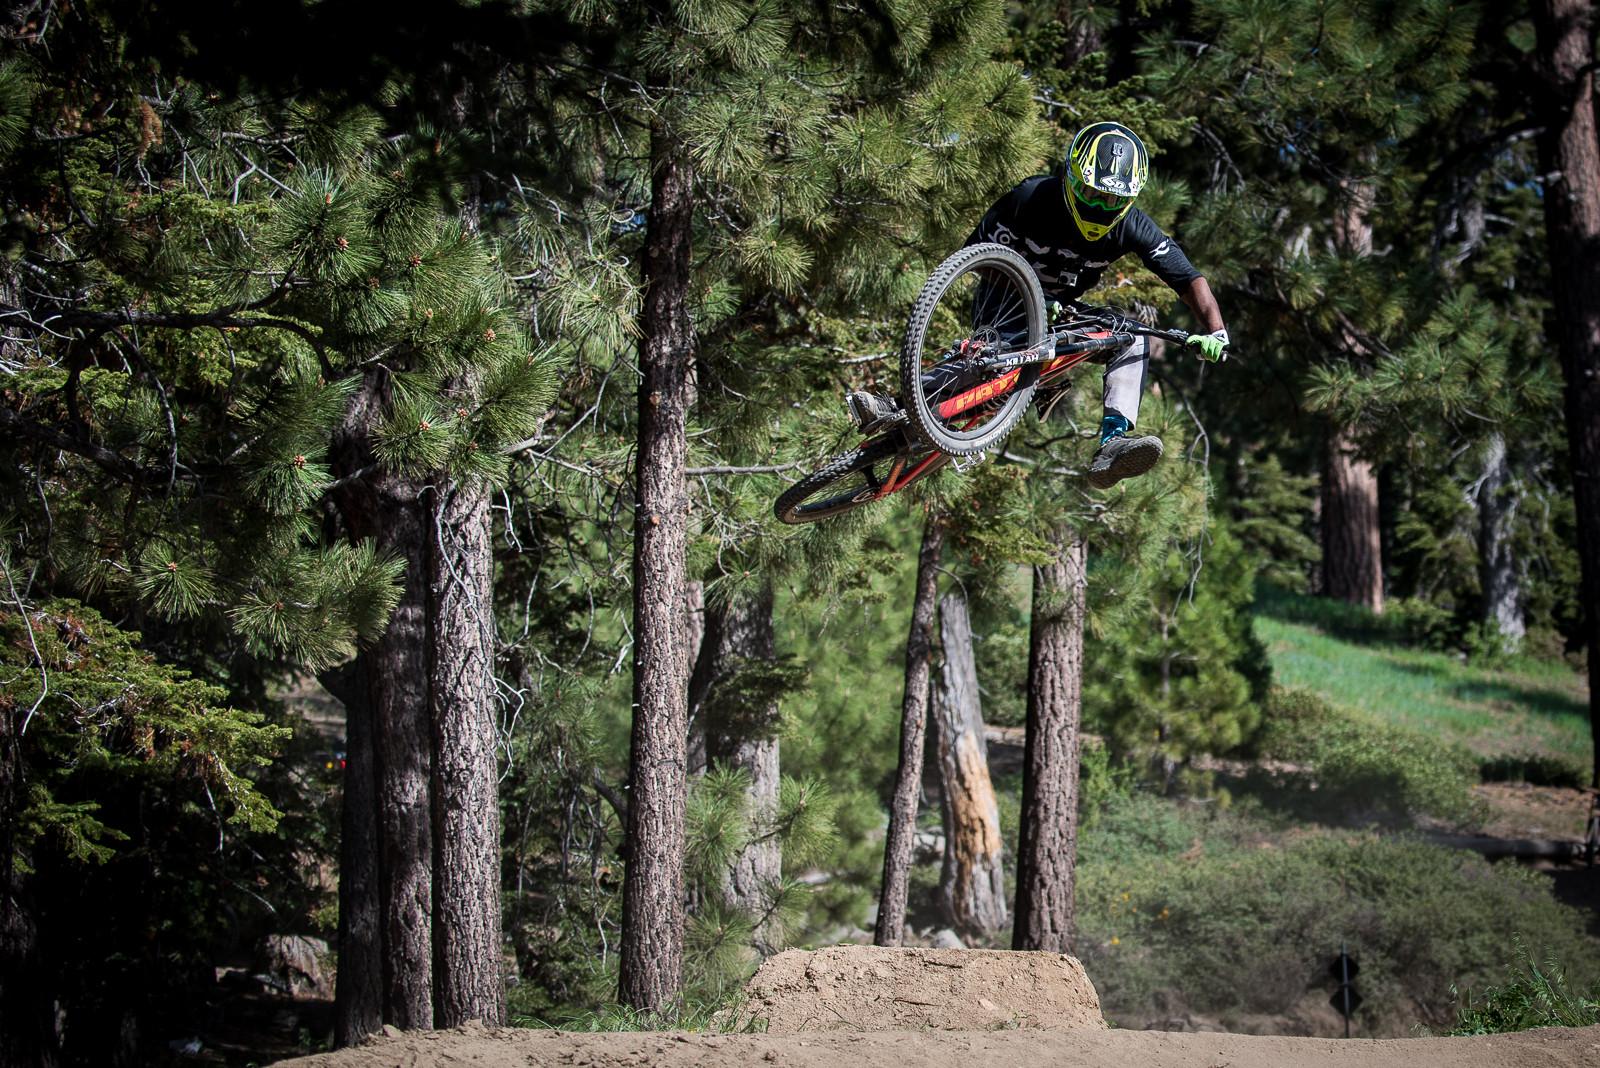 Cody Johnson - Vital Ditch Day 2016 at Snow Summit Bike Park - Mountain Biking Pictures - Vital MTB